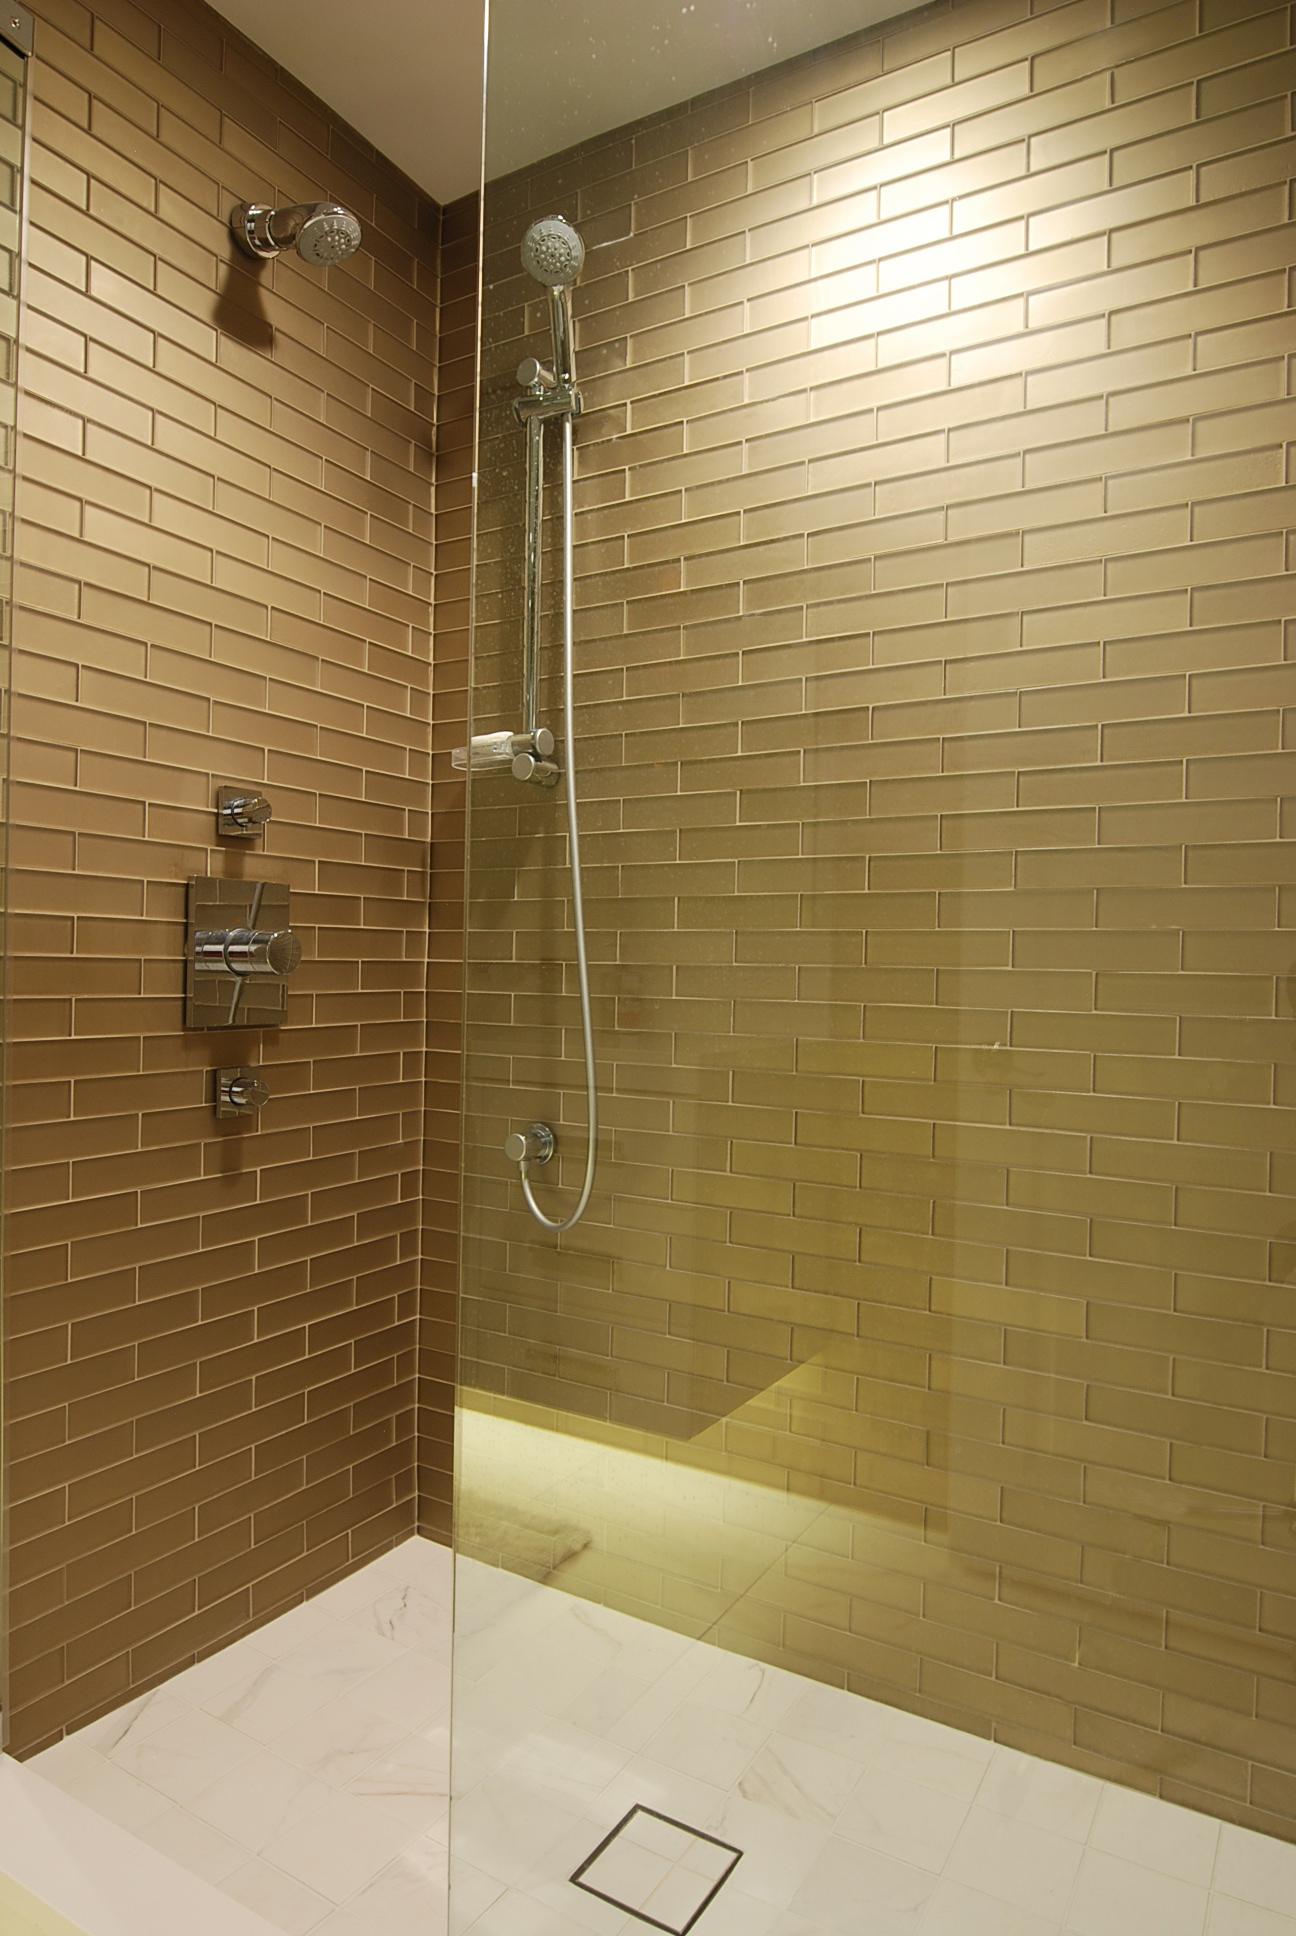 Bathroom remodeling tips for choosing tile for your shower for Selecting bathroom tile